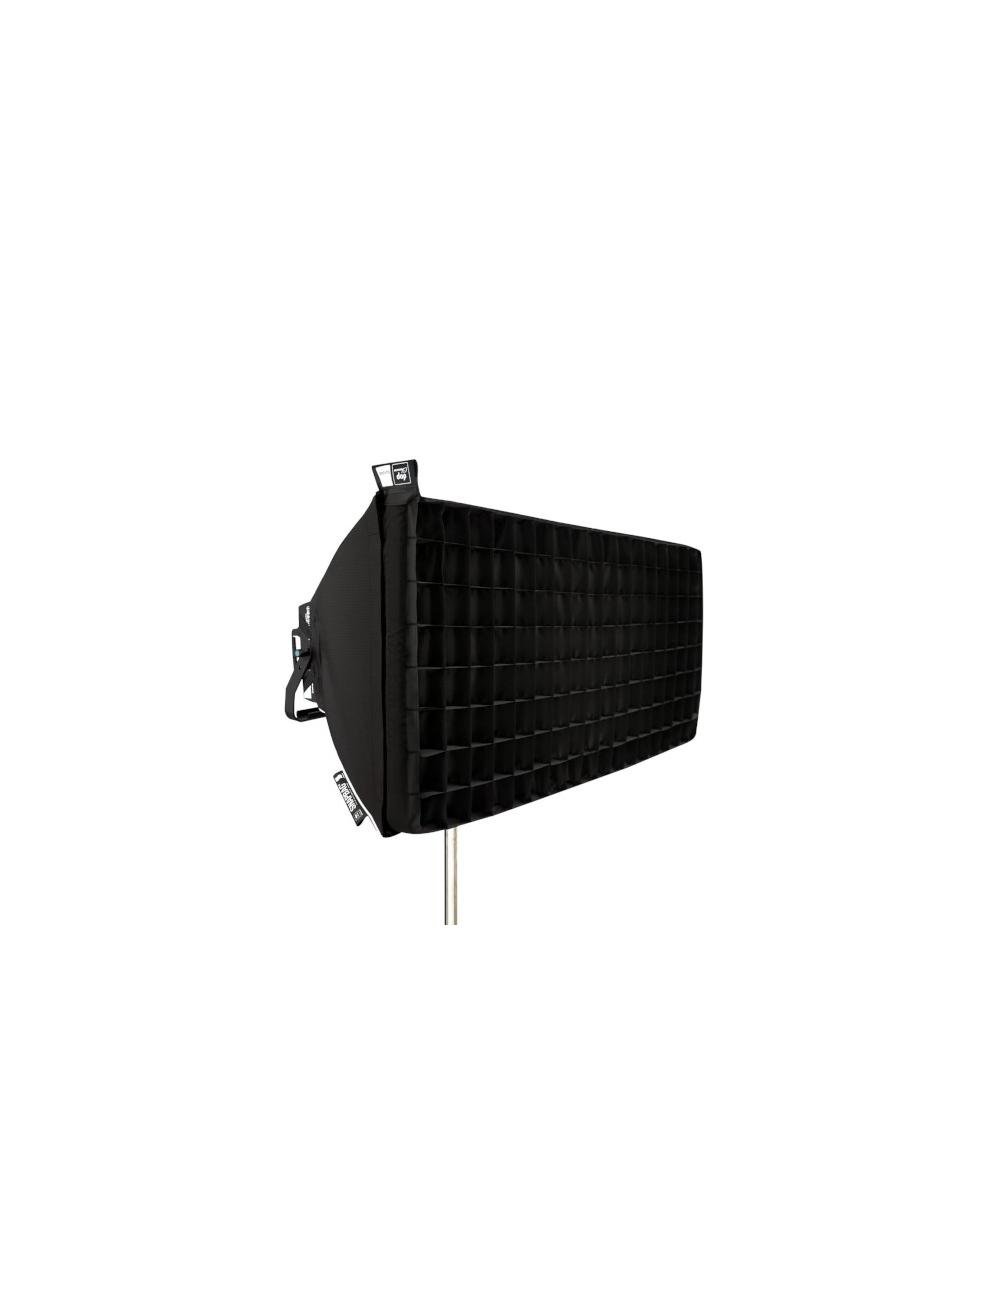 Litepanels DoPchoice SNAPGRID for Gemini 2x1 - Horizontal Array - SNAPBAG fit